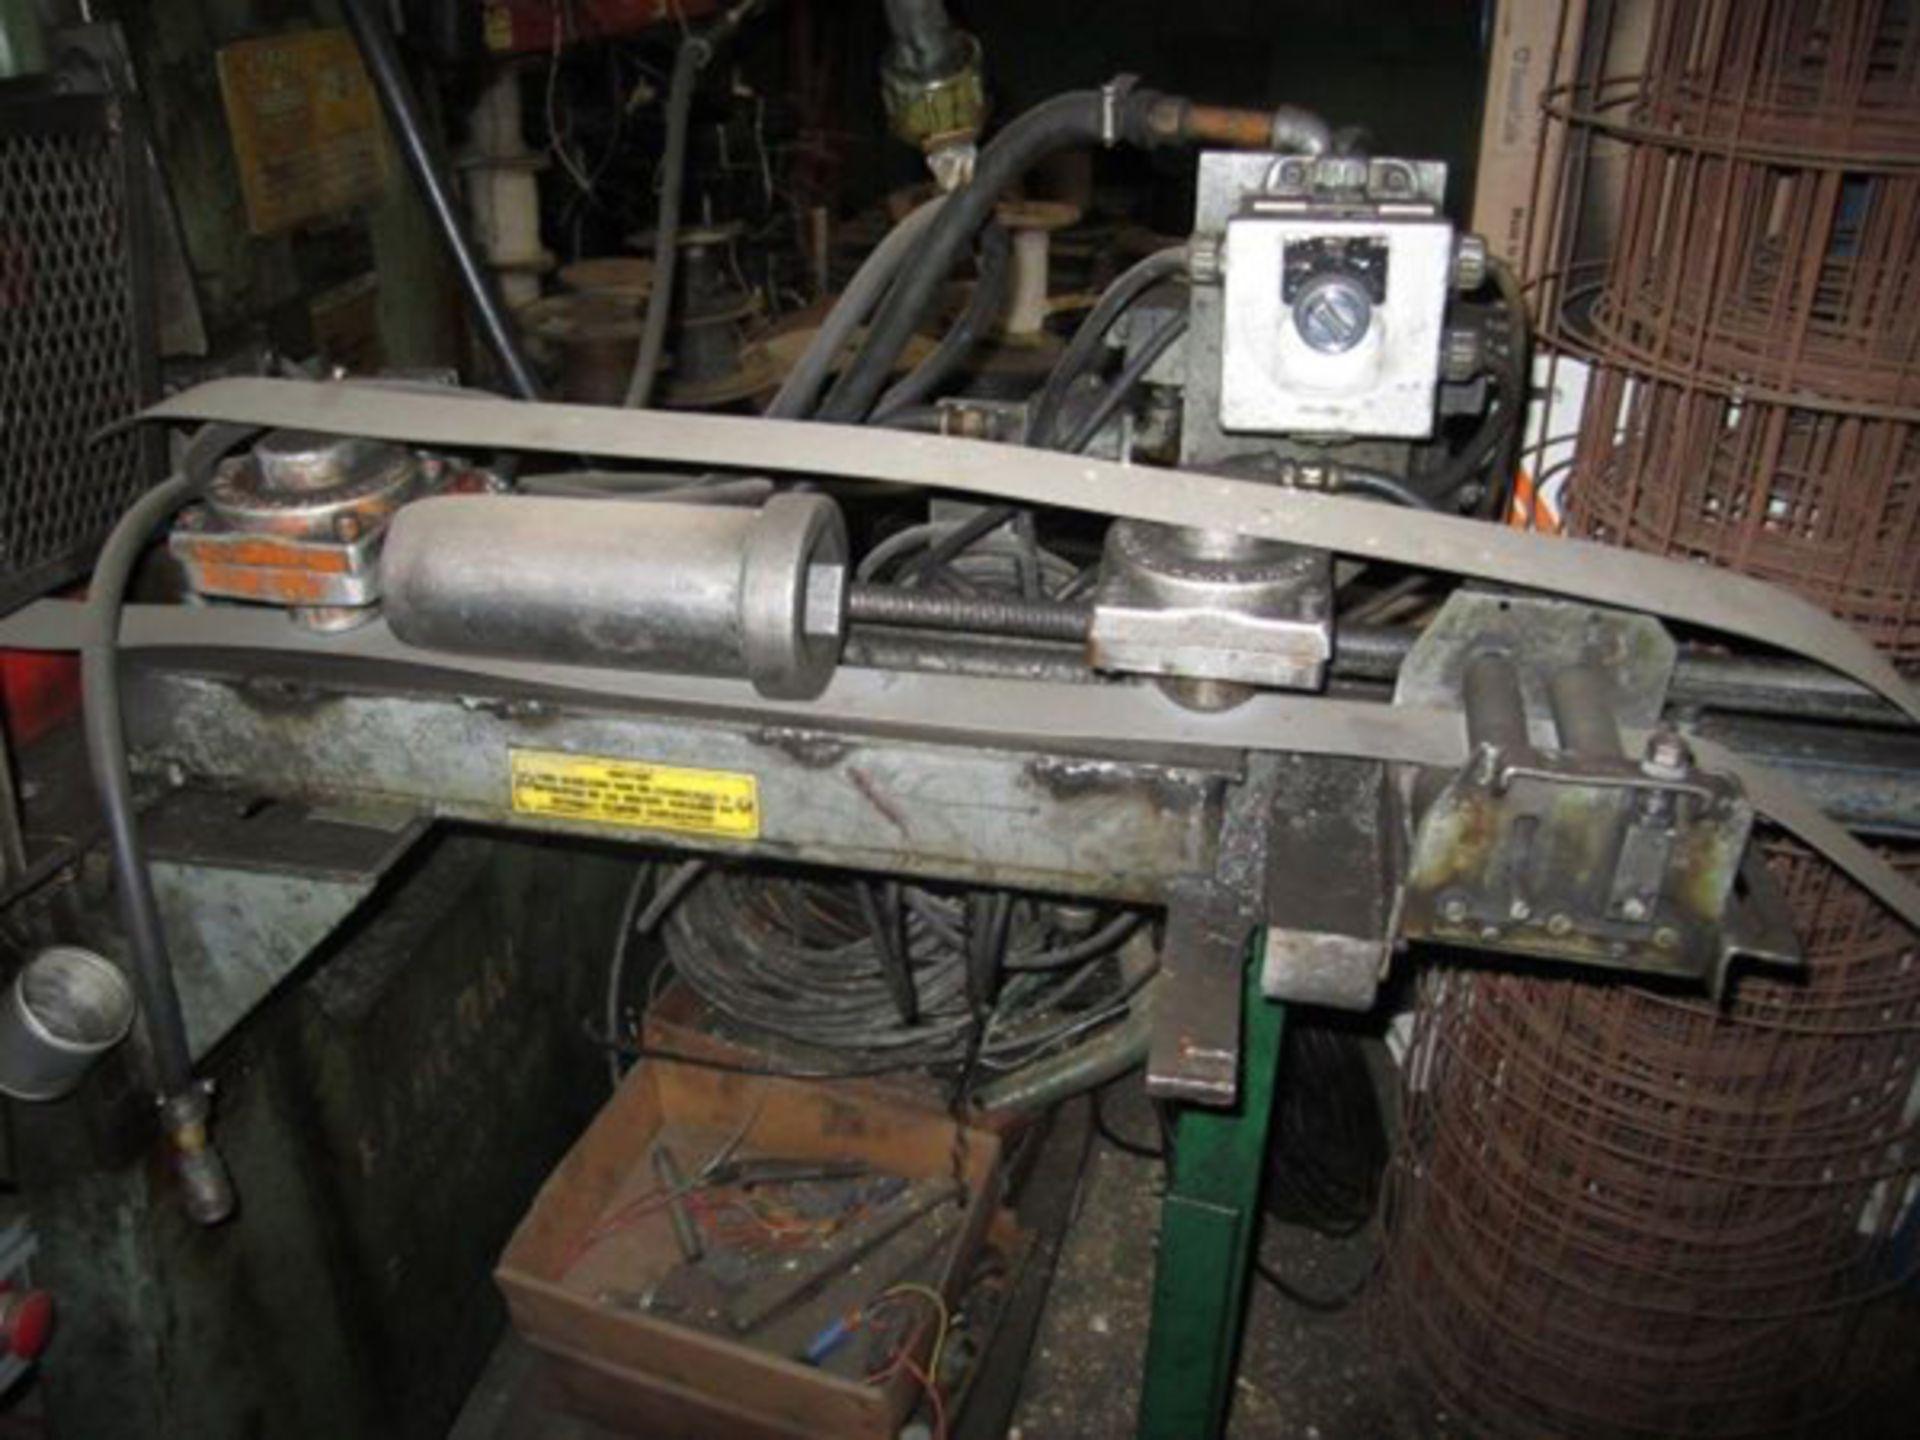 "Federal OBI Punch Press   60-Ton x 29 1/2"" x 18 1/2"", Mdl: F-5, S/N: 125400 - 6397P - Image 5 of 6"